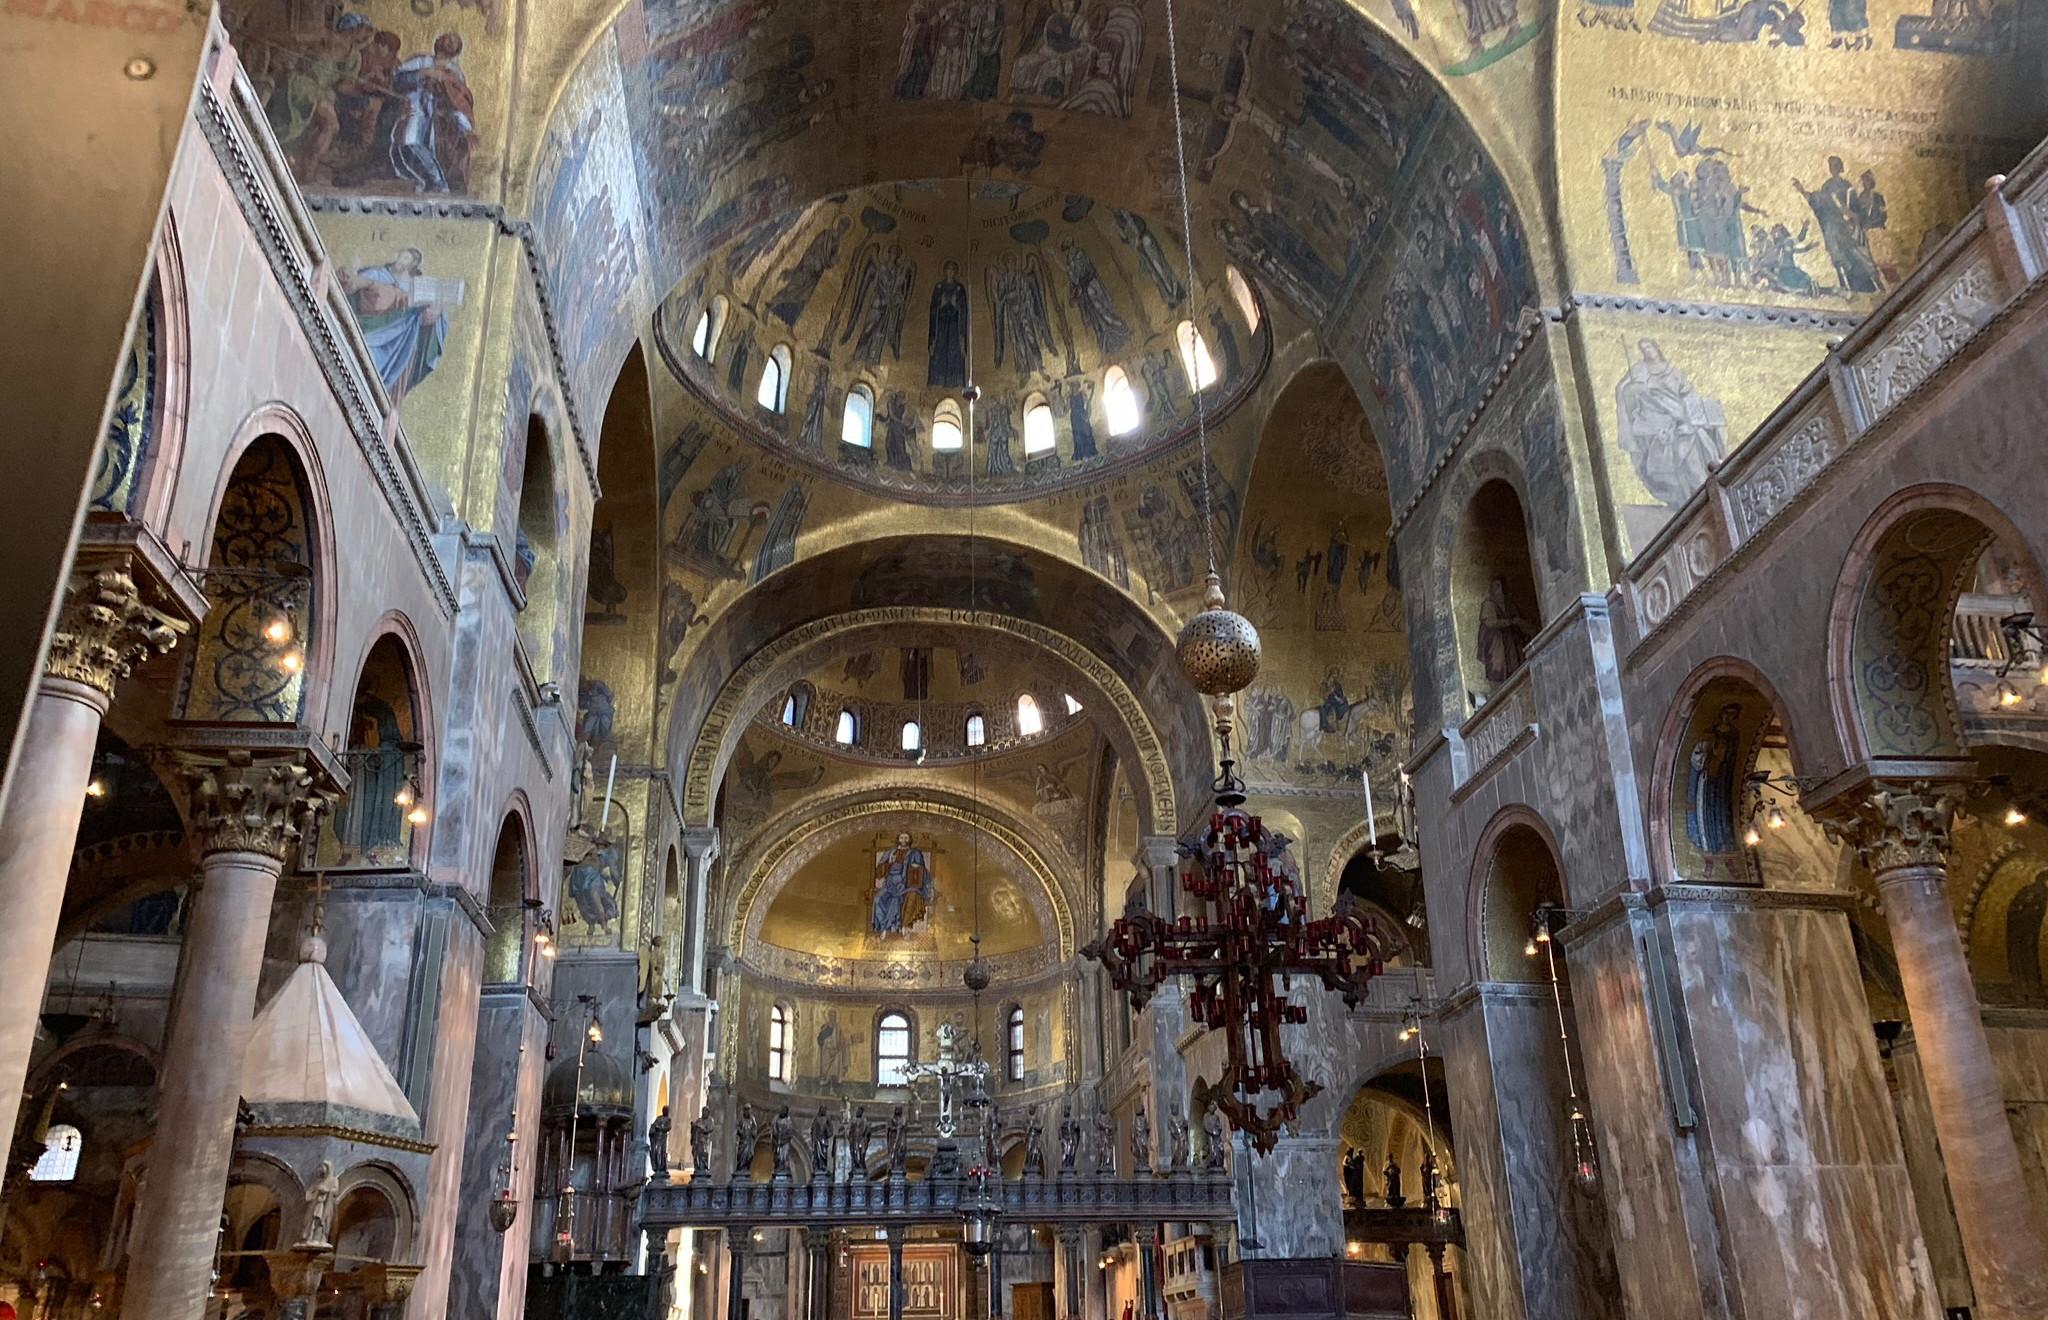 The lavish St. Mark's Basilica